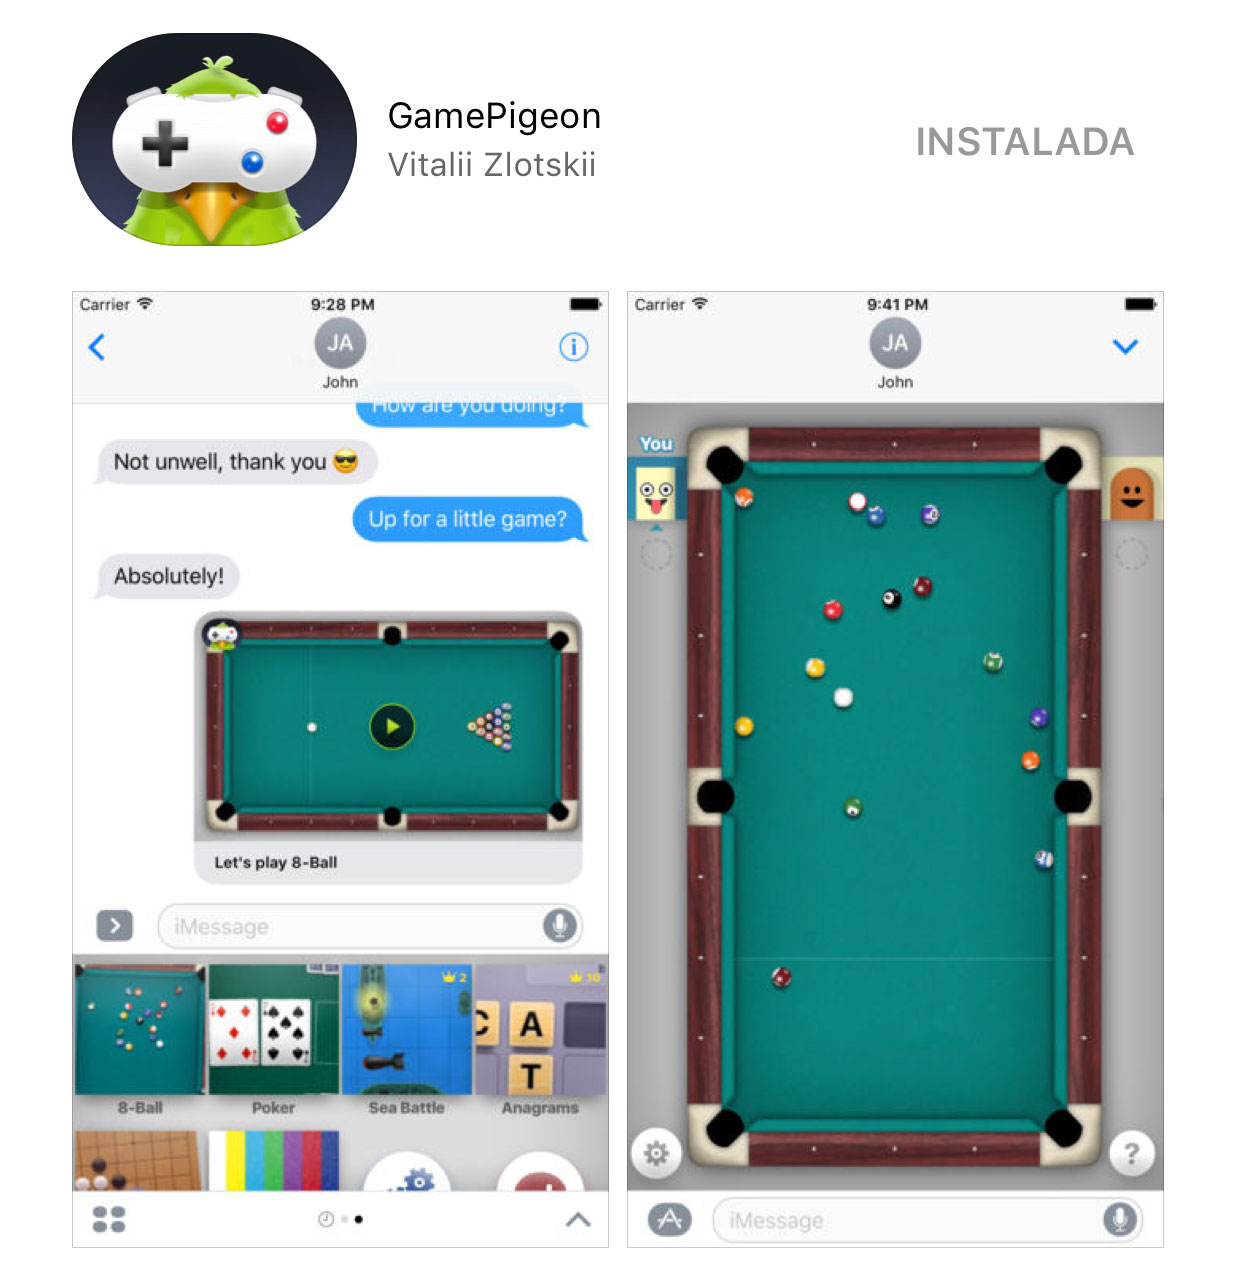 GamePigeon para la App de Mensajes